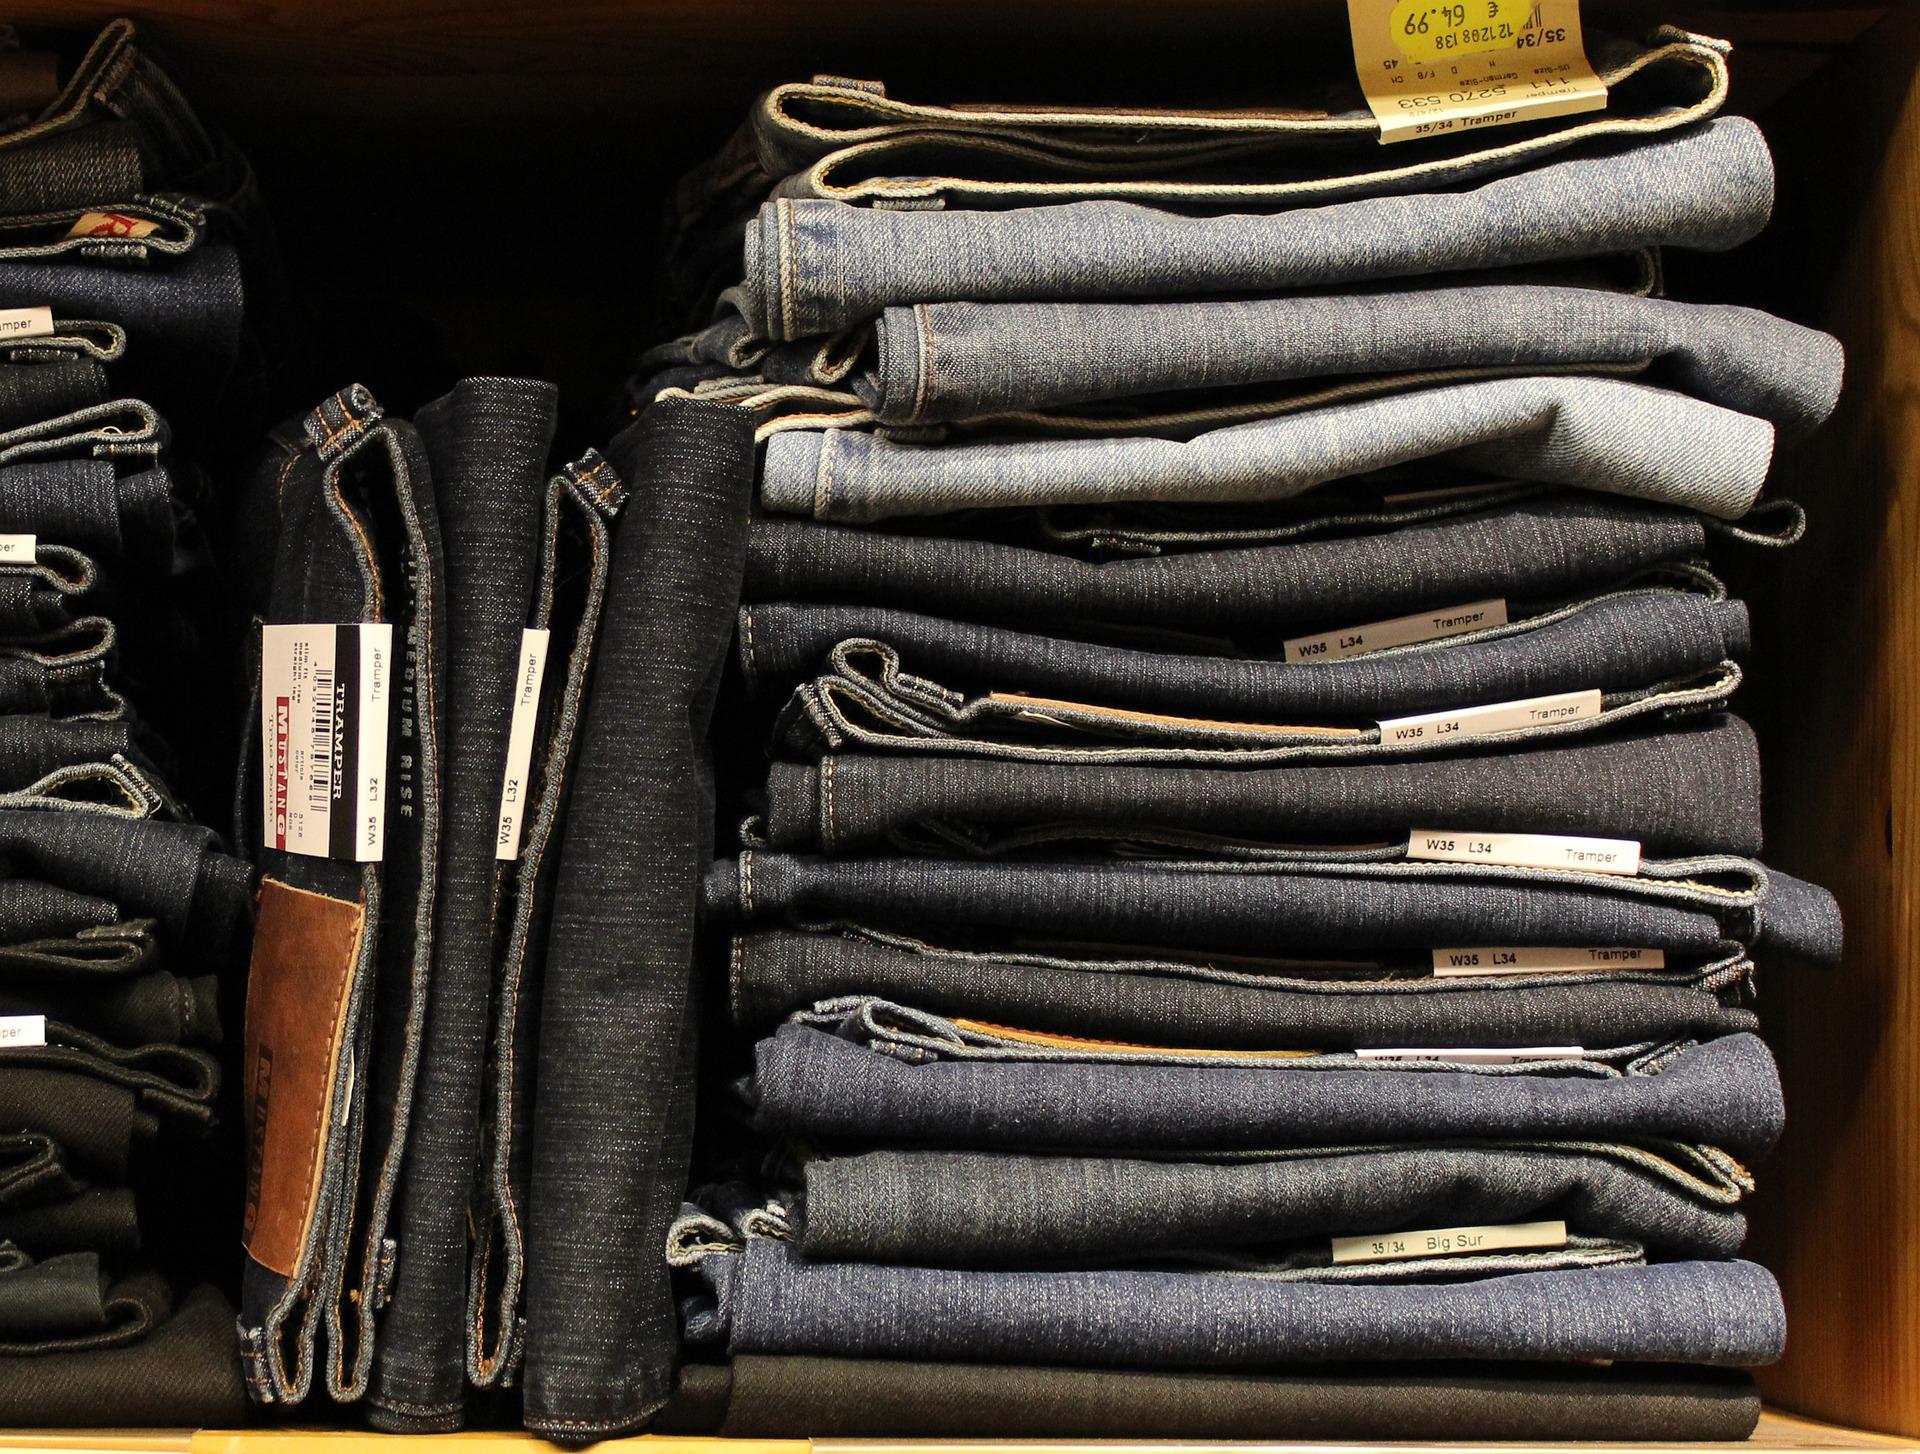 Hosenarten für Männer Jeans